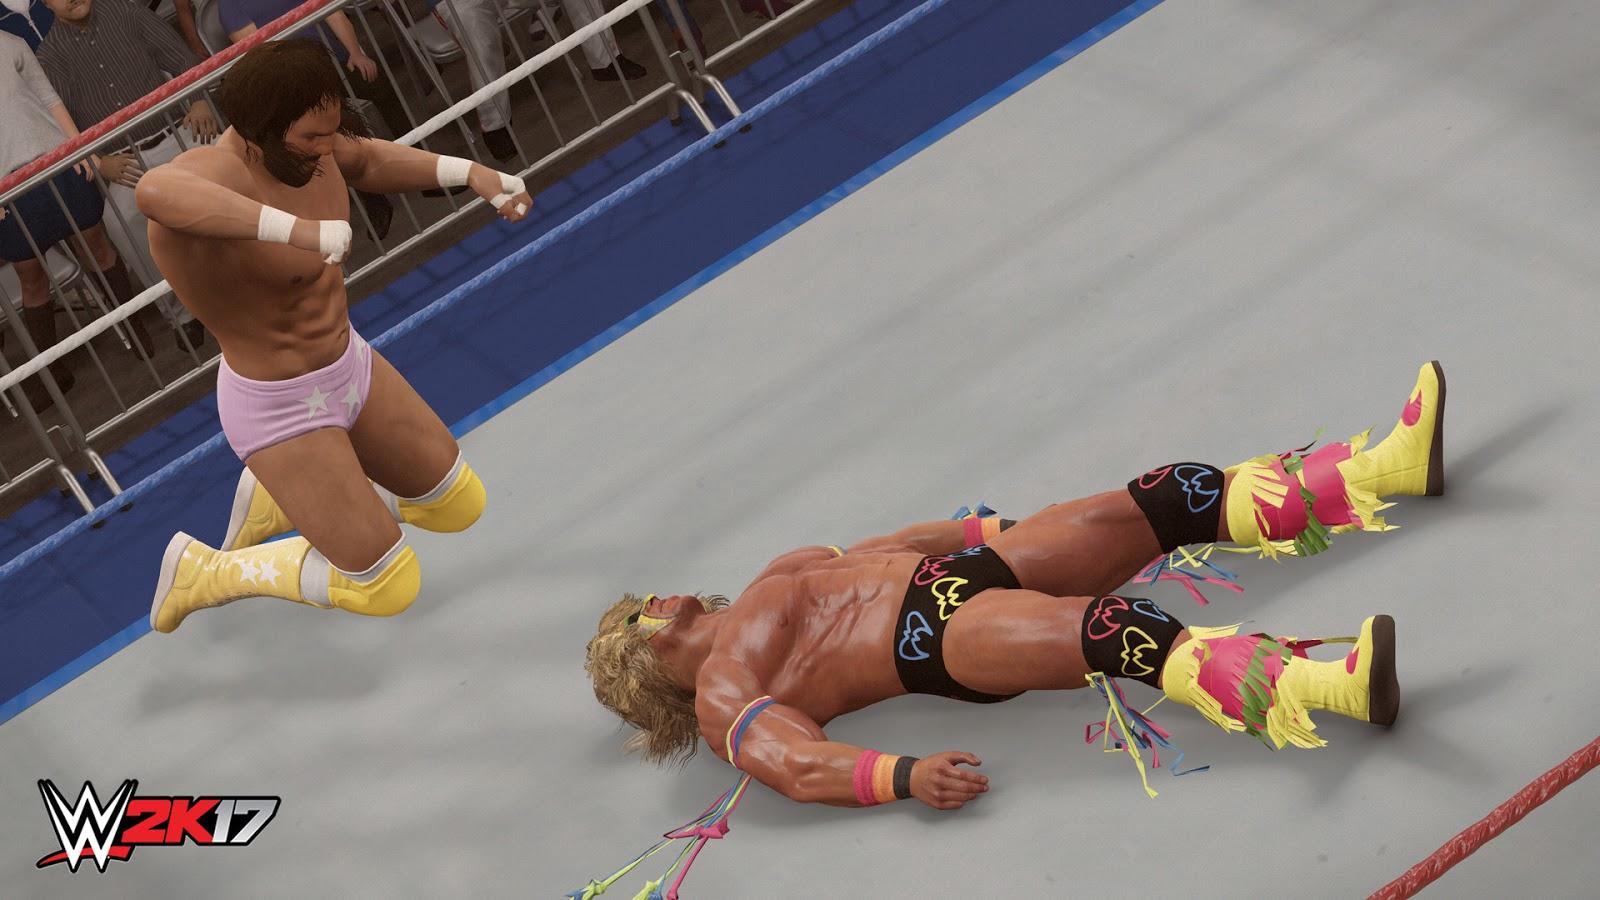 WWE 2K17 ESPAÑOL PC Descargar Full (CODEX) + REPACK 10 DVD5 (JPW) 2